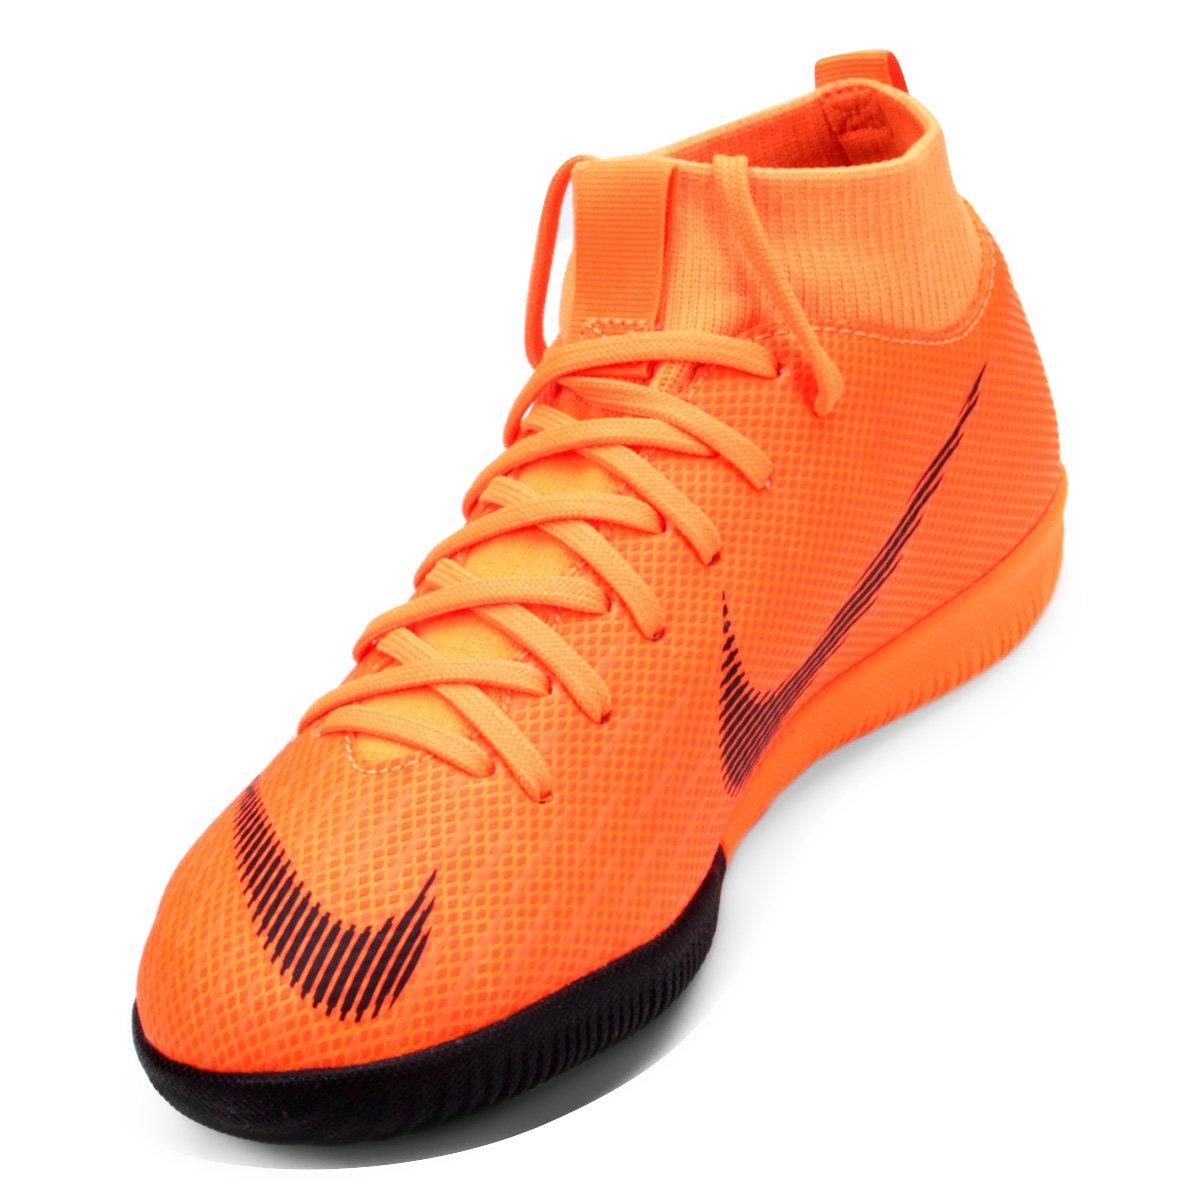 05949b4247 Chuteira Futsal Infantil Nike Mercurial Superfly 6 Academy - Laranja ...